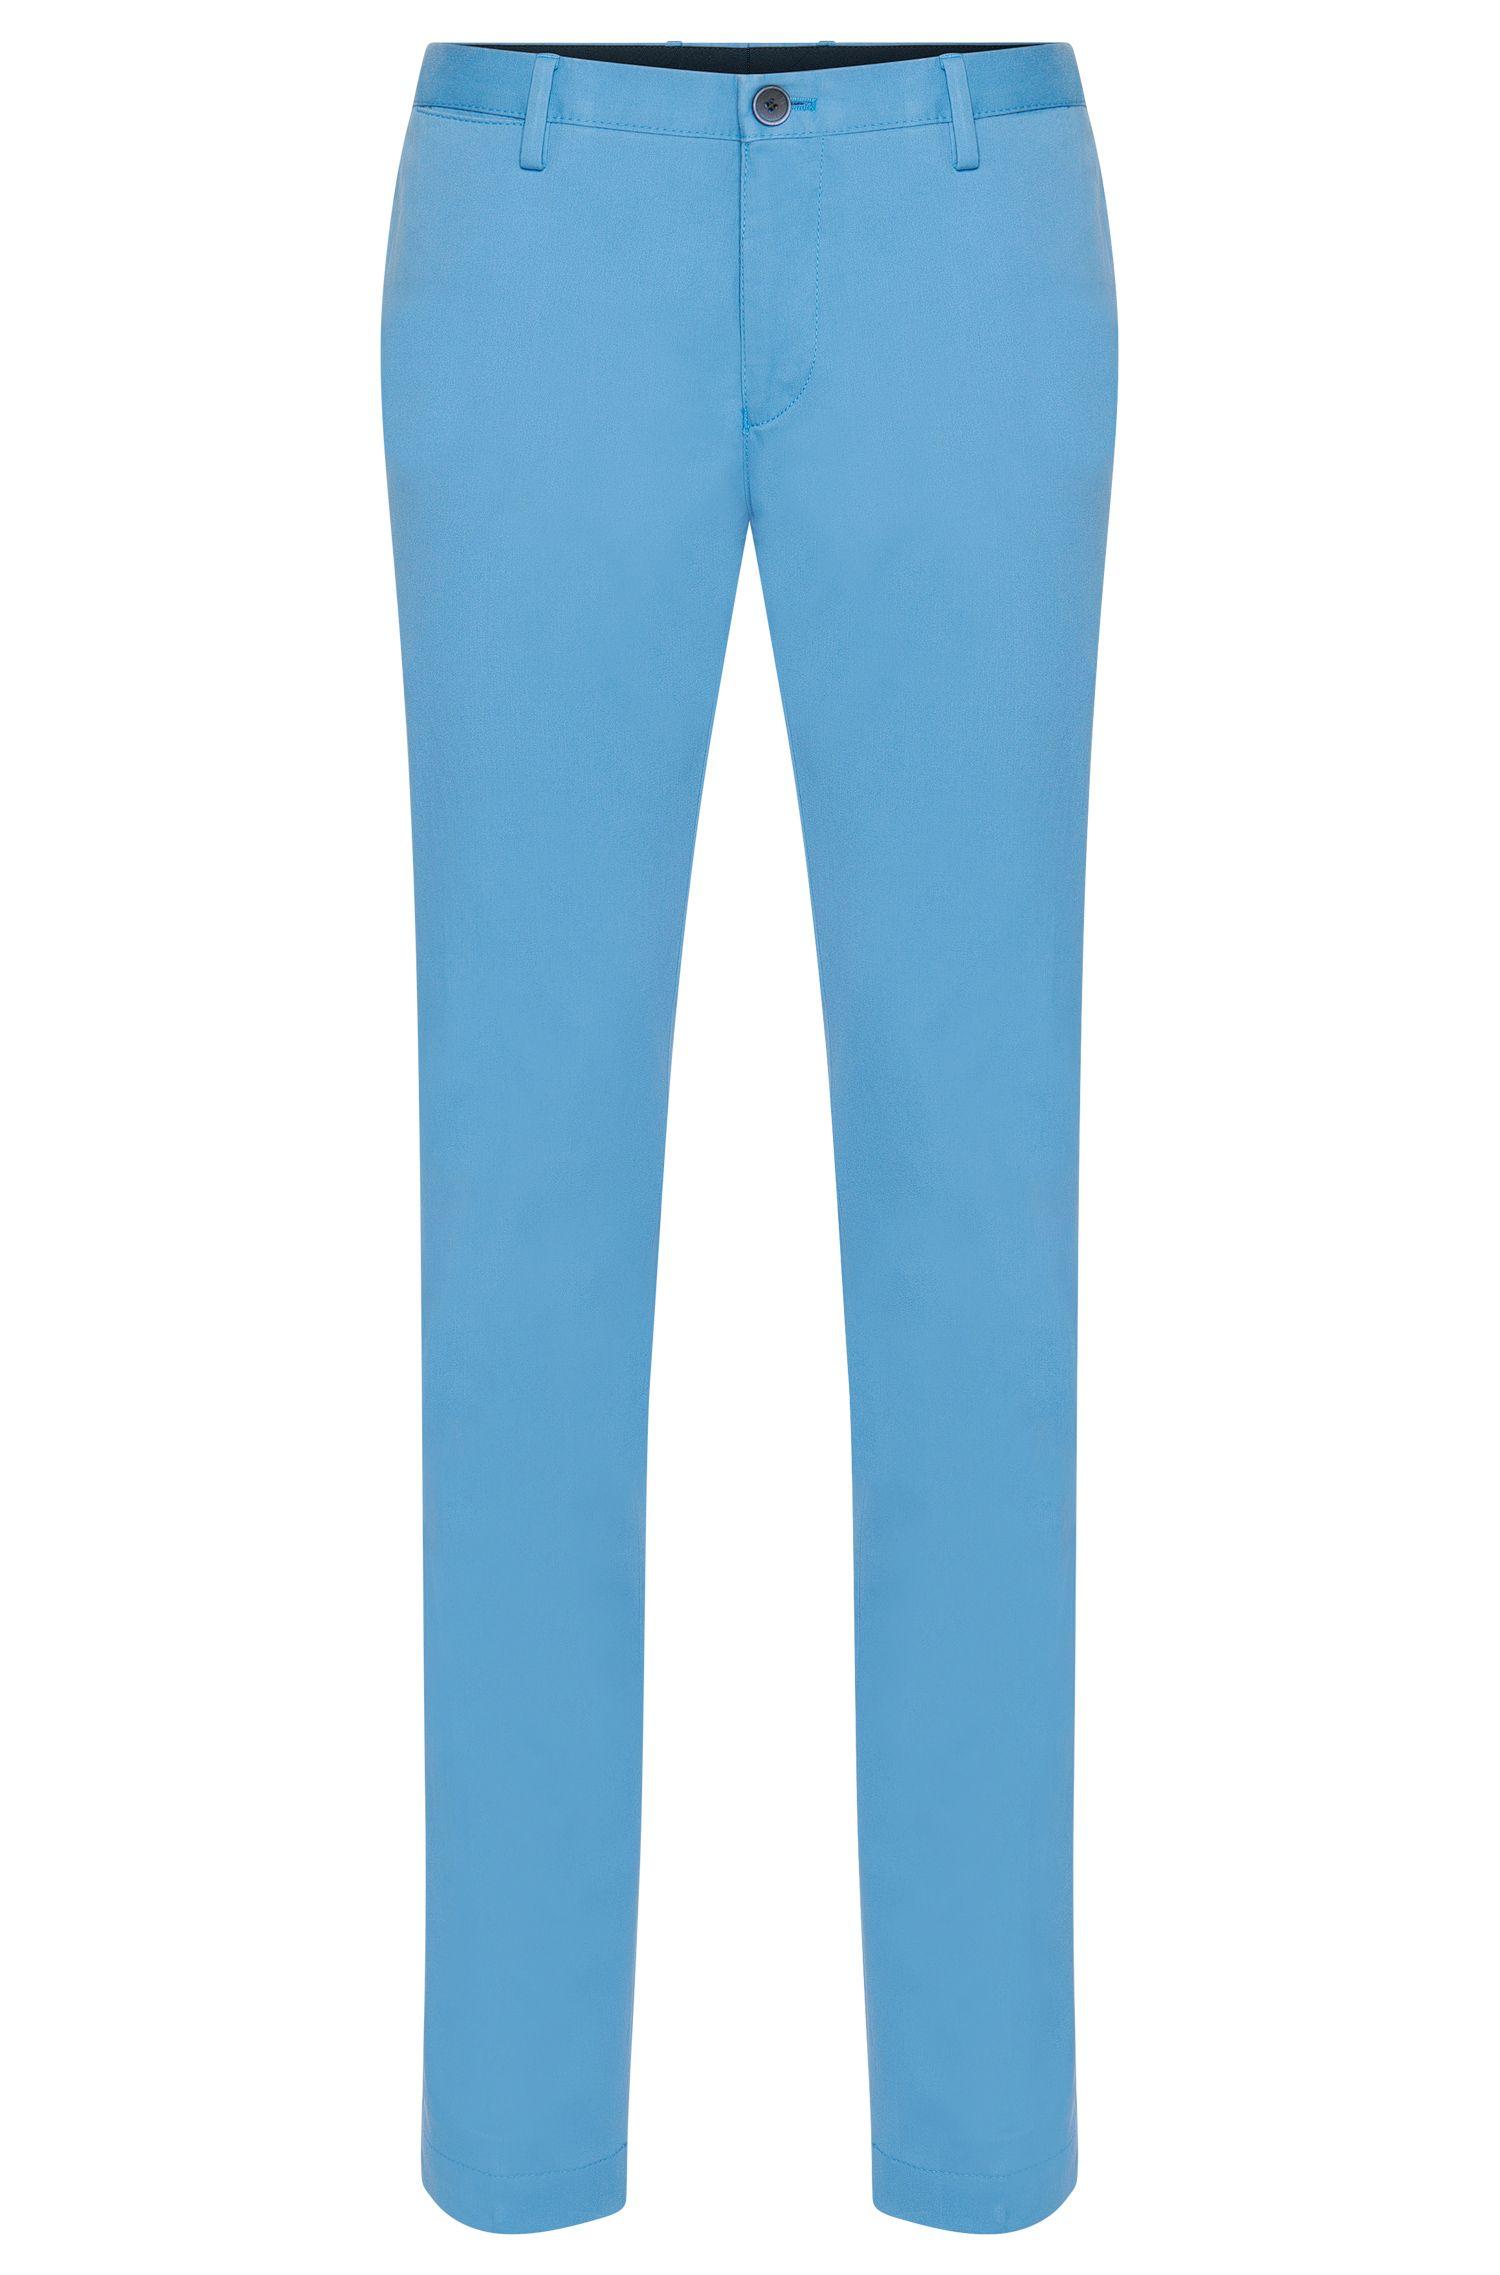 Stretch Cotton Chino Pant, Slim Fit | Stanino W